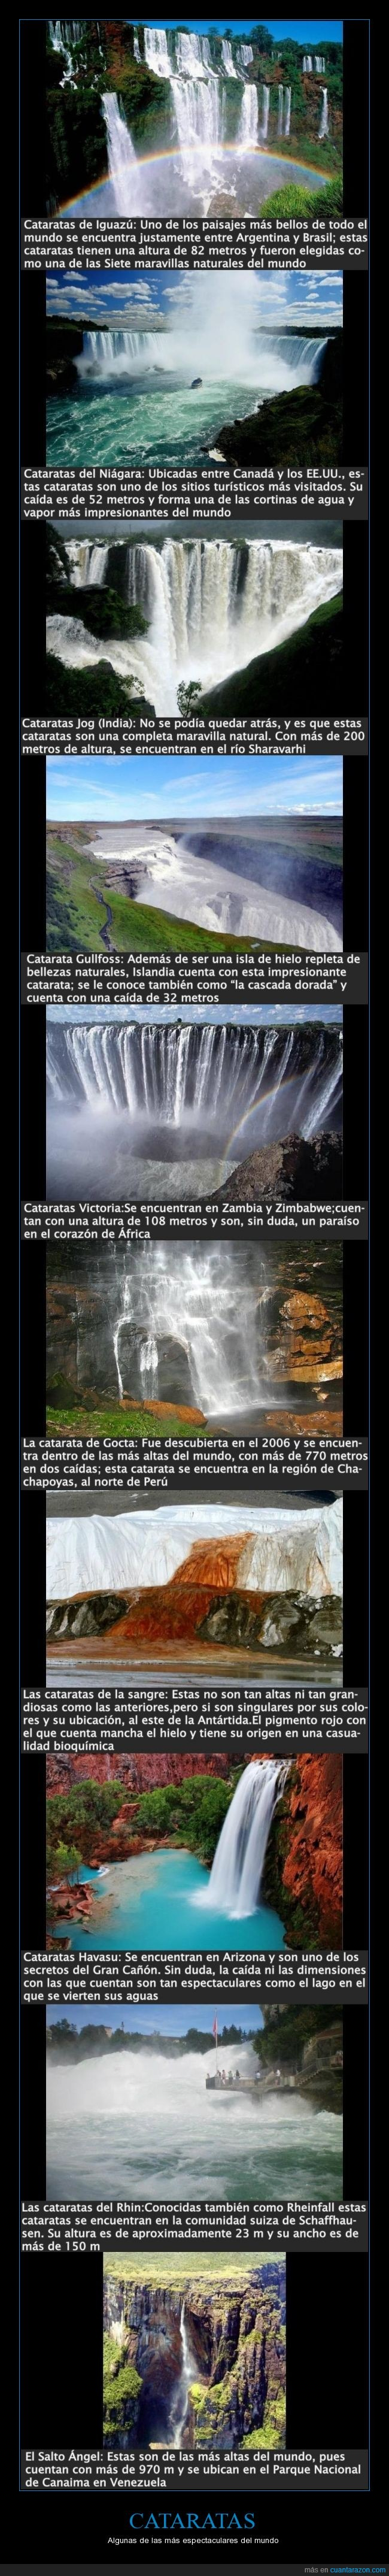 Argentina,Brasil,Canadá,Catarata Gullfoss,Cataratas del Niágara,Cataratas Jog,Estados Unidos,India,río Sharavarhi